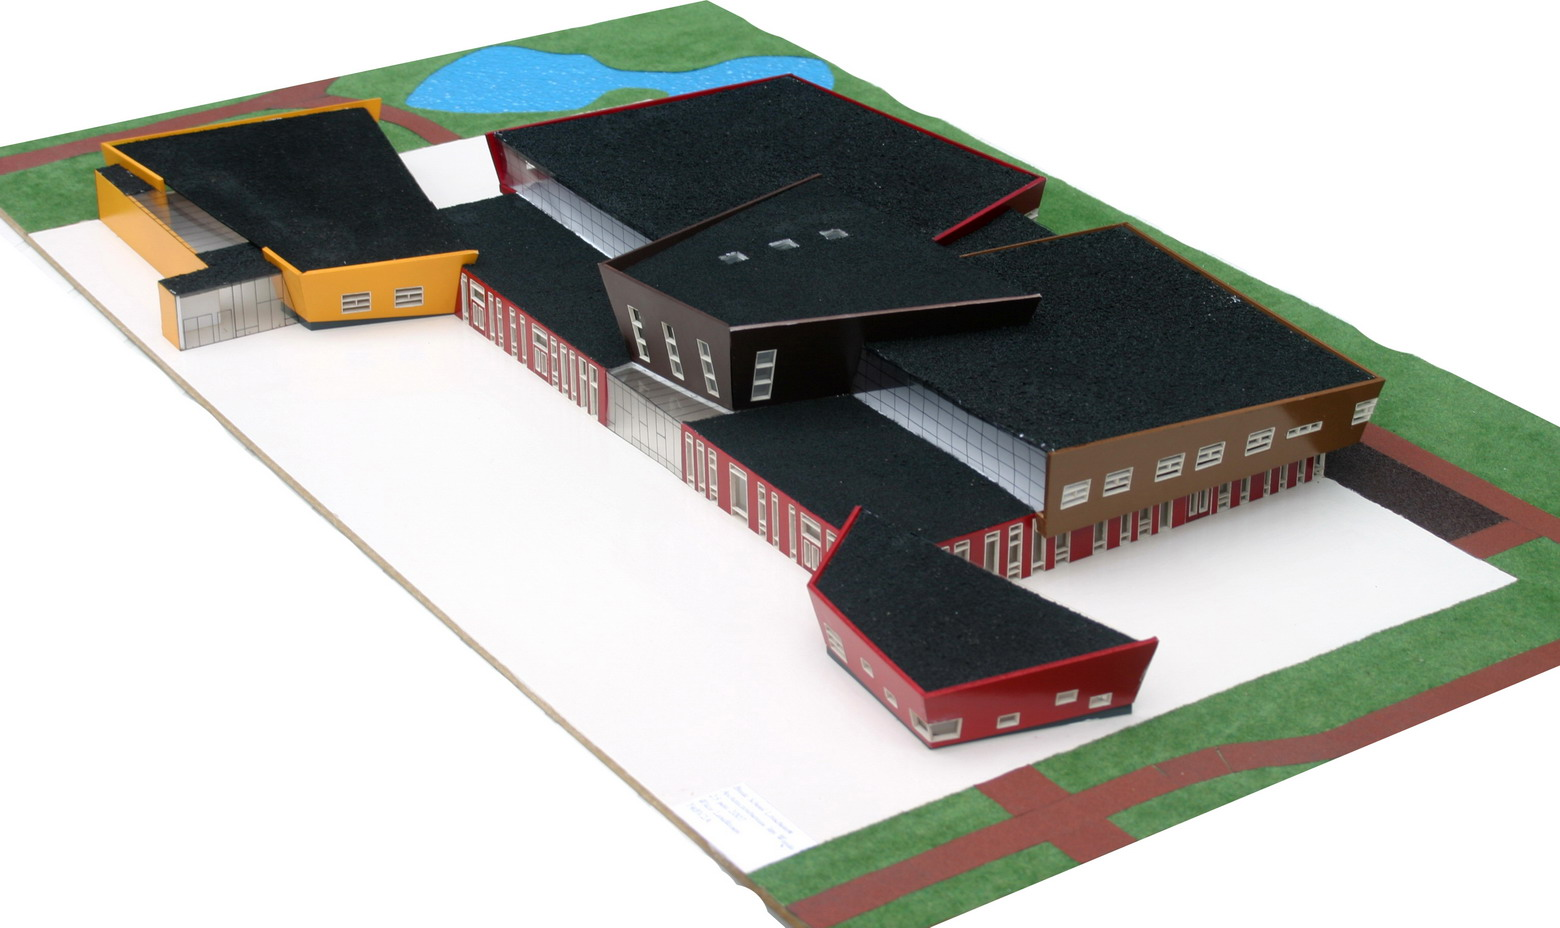 maquette brede school